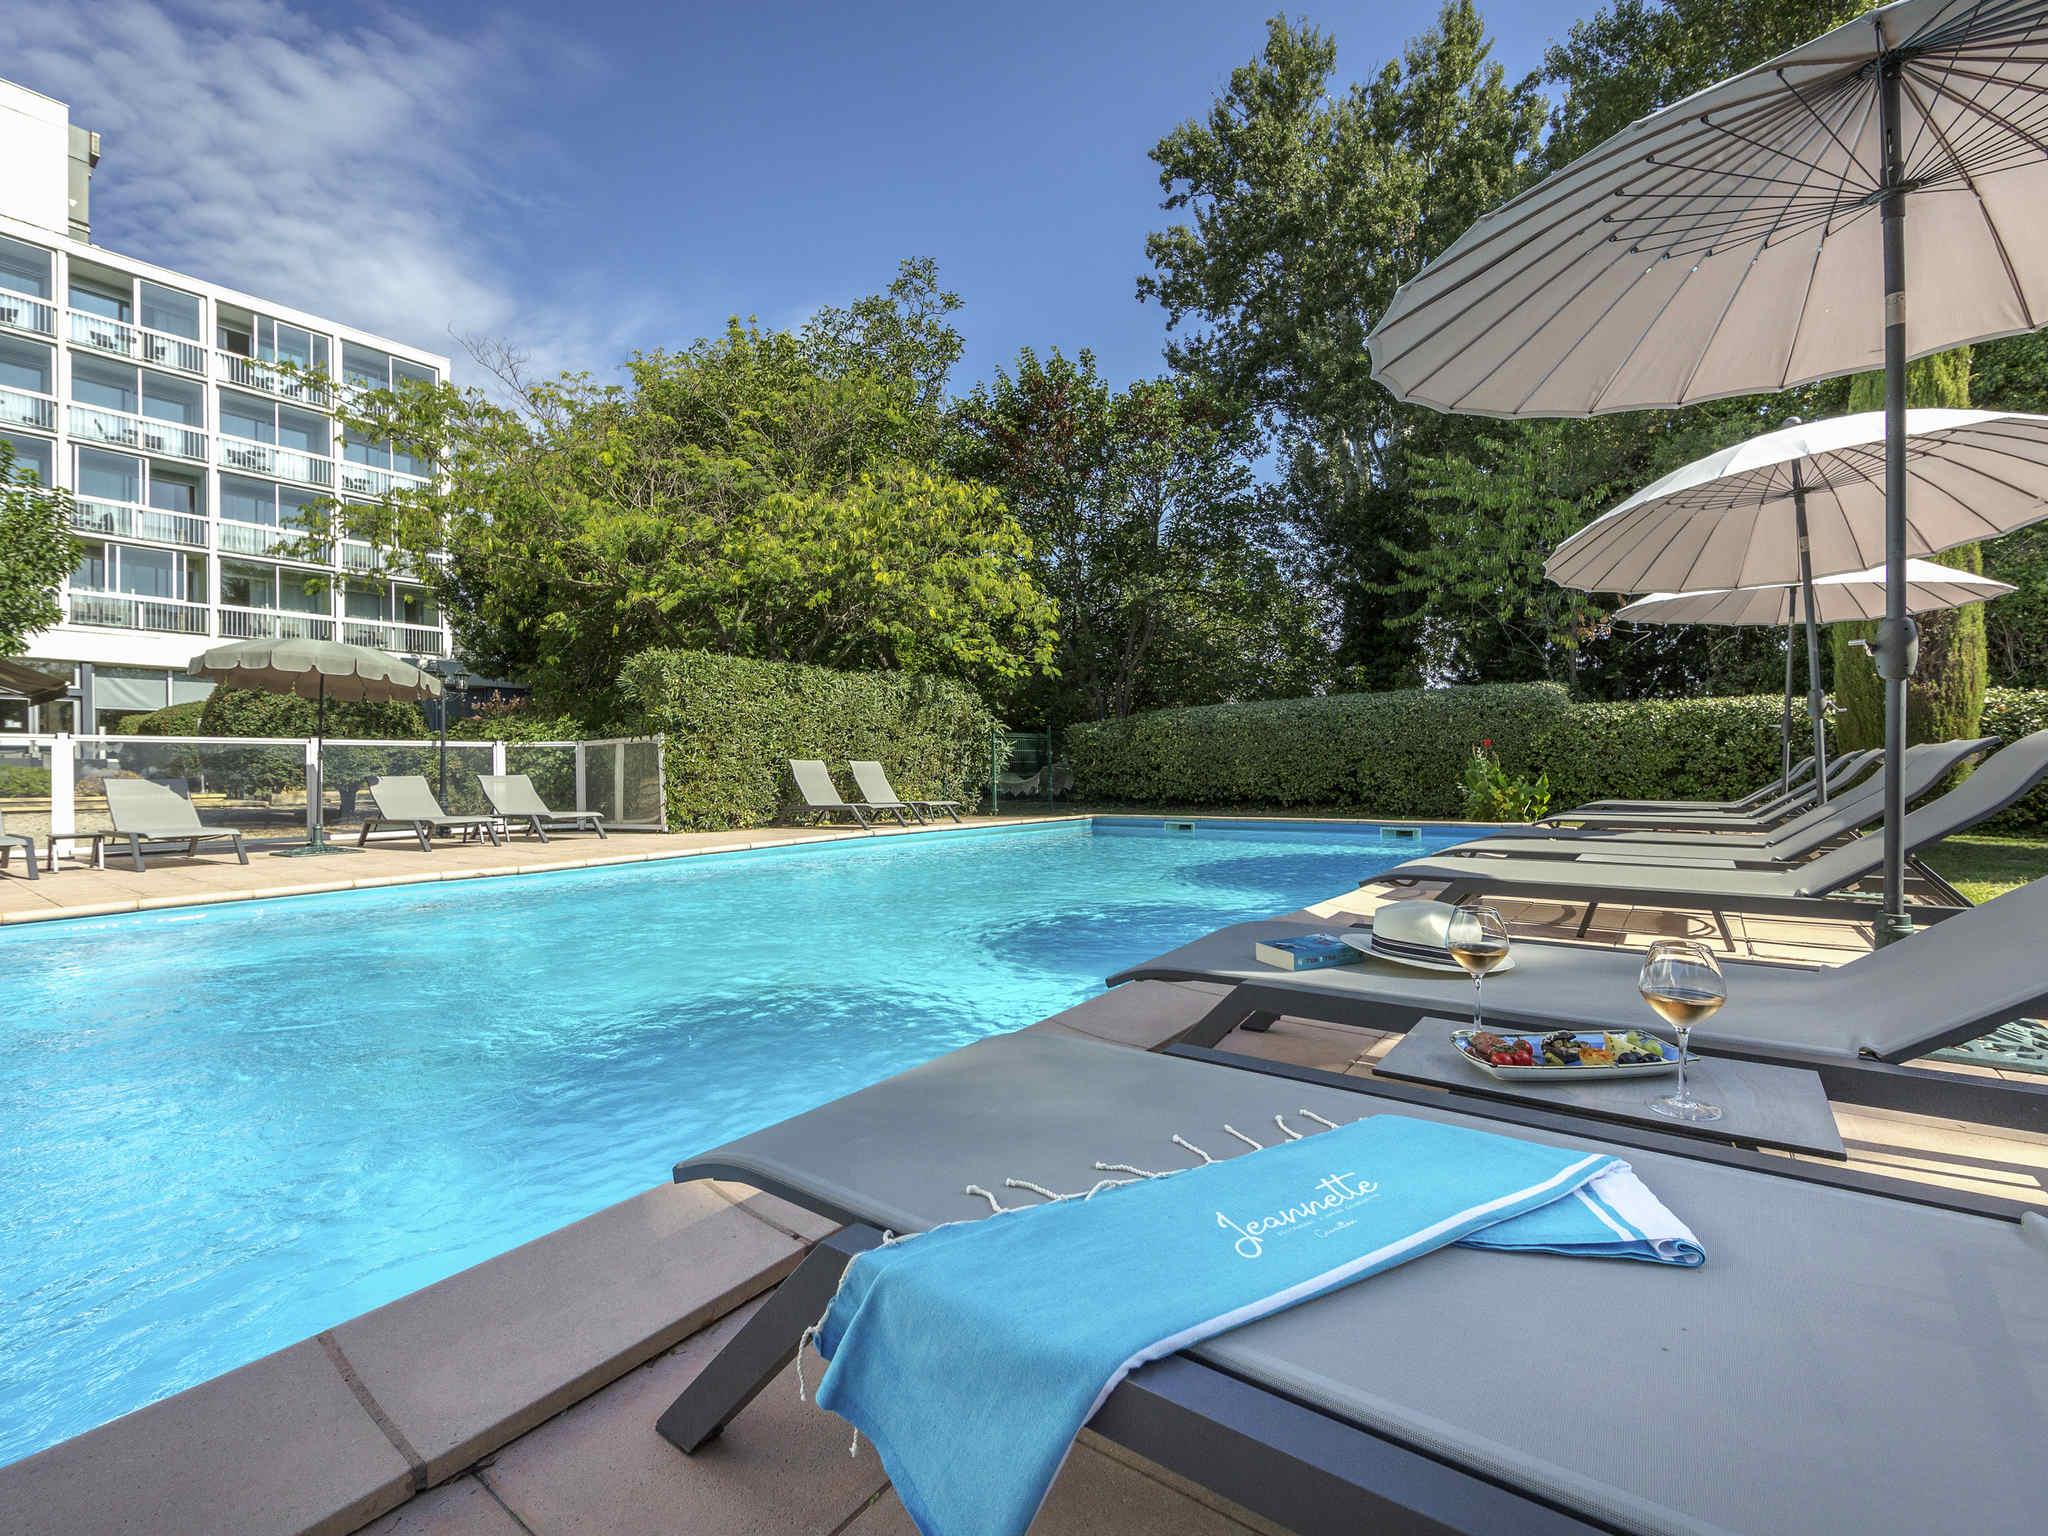 Hotel – Hotel Mercure Cavaillon Portes du Luberon